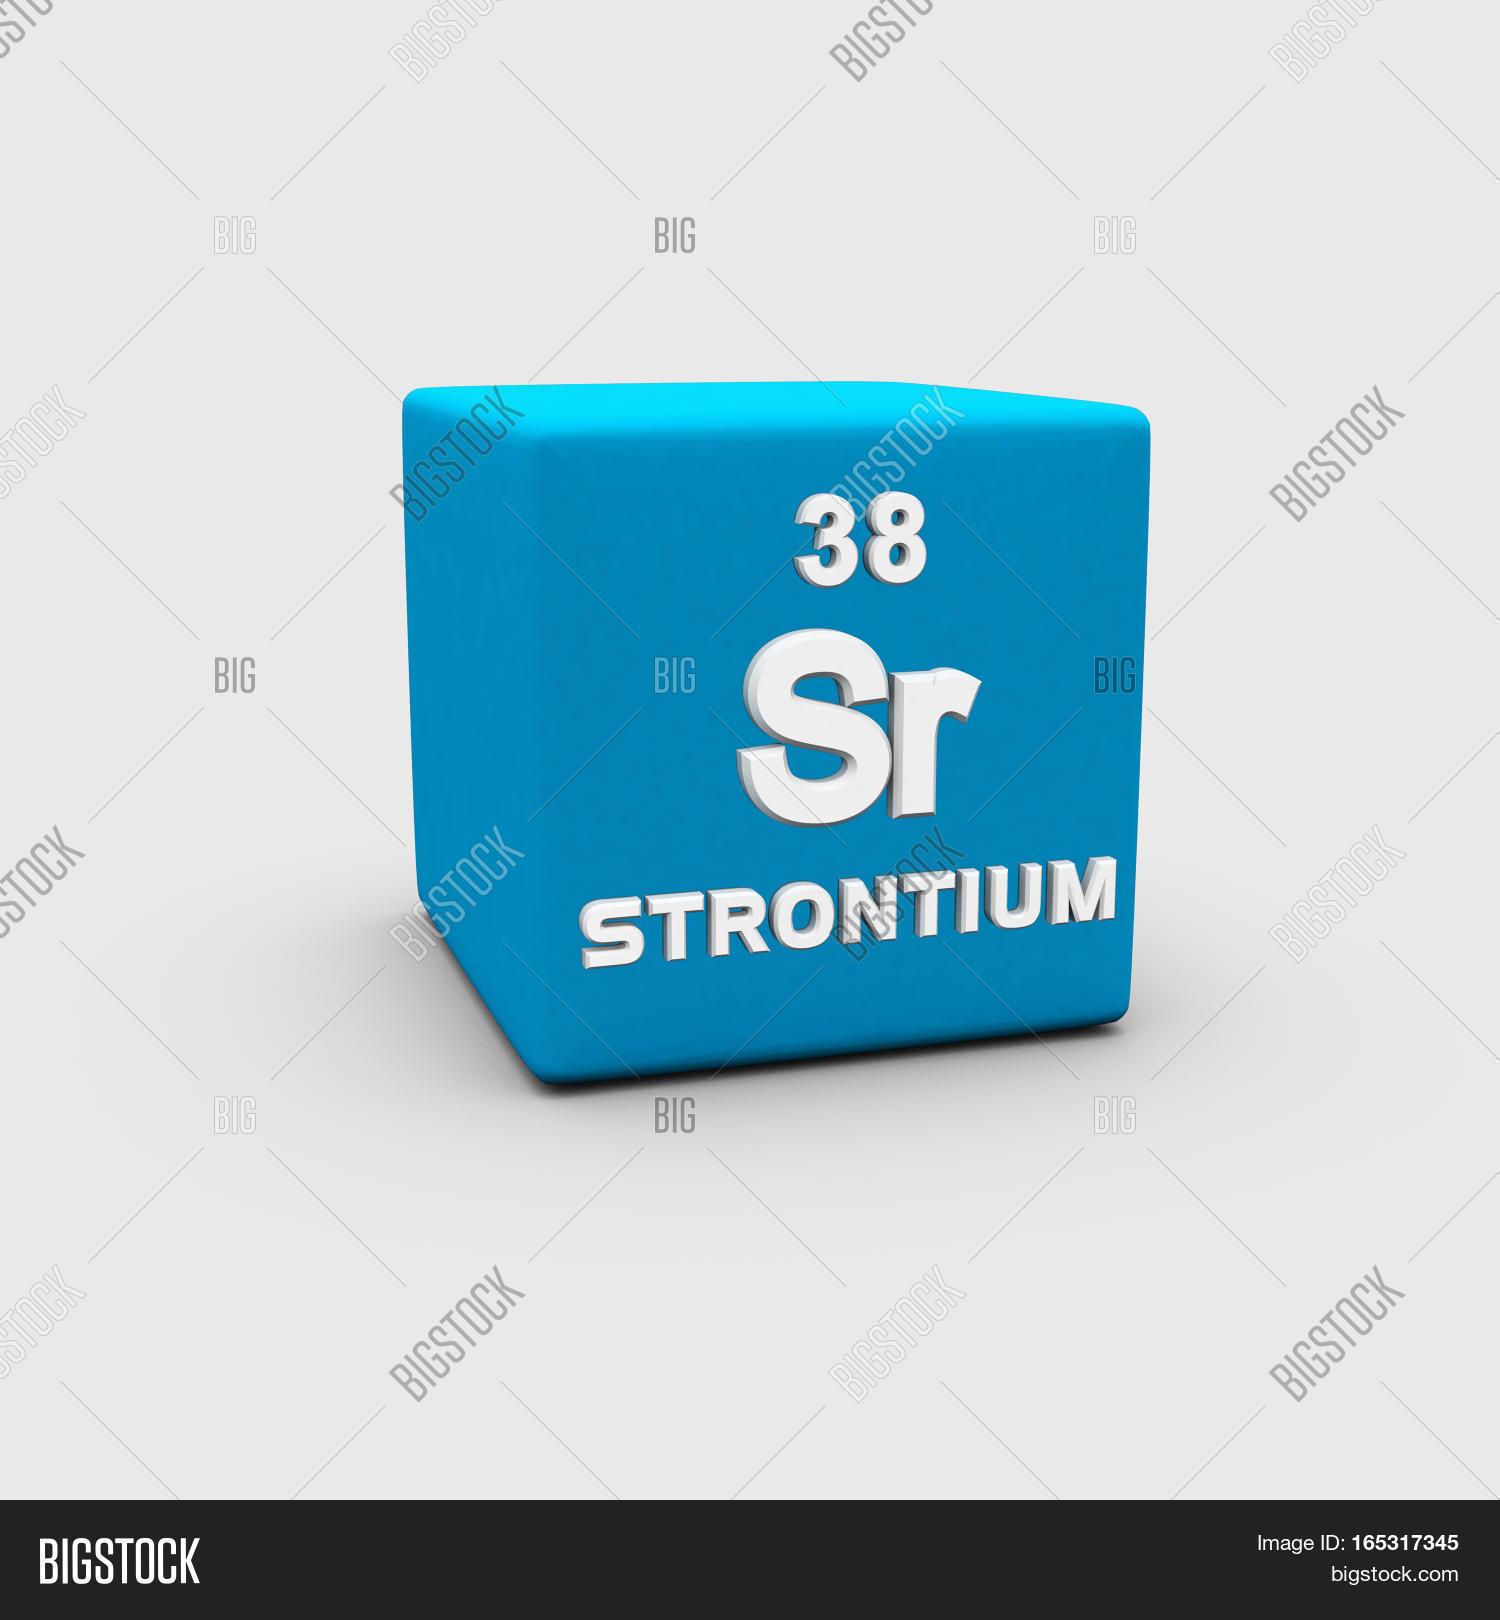 Strontium Chemical Image Photo Free Trial Bigstock